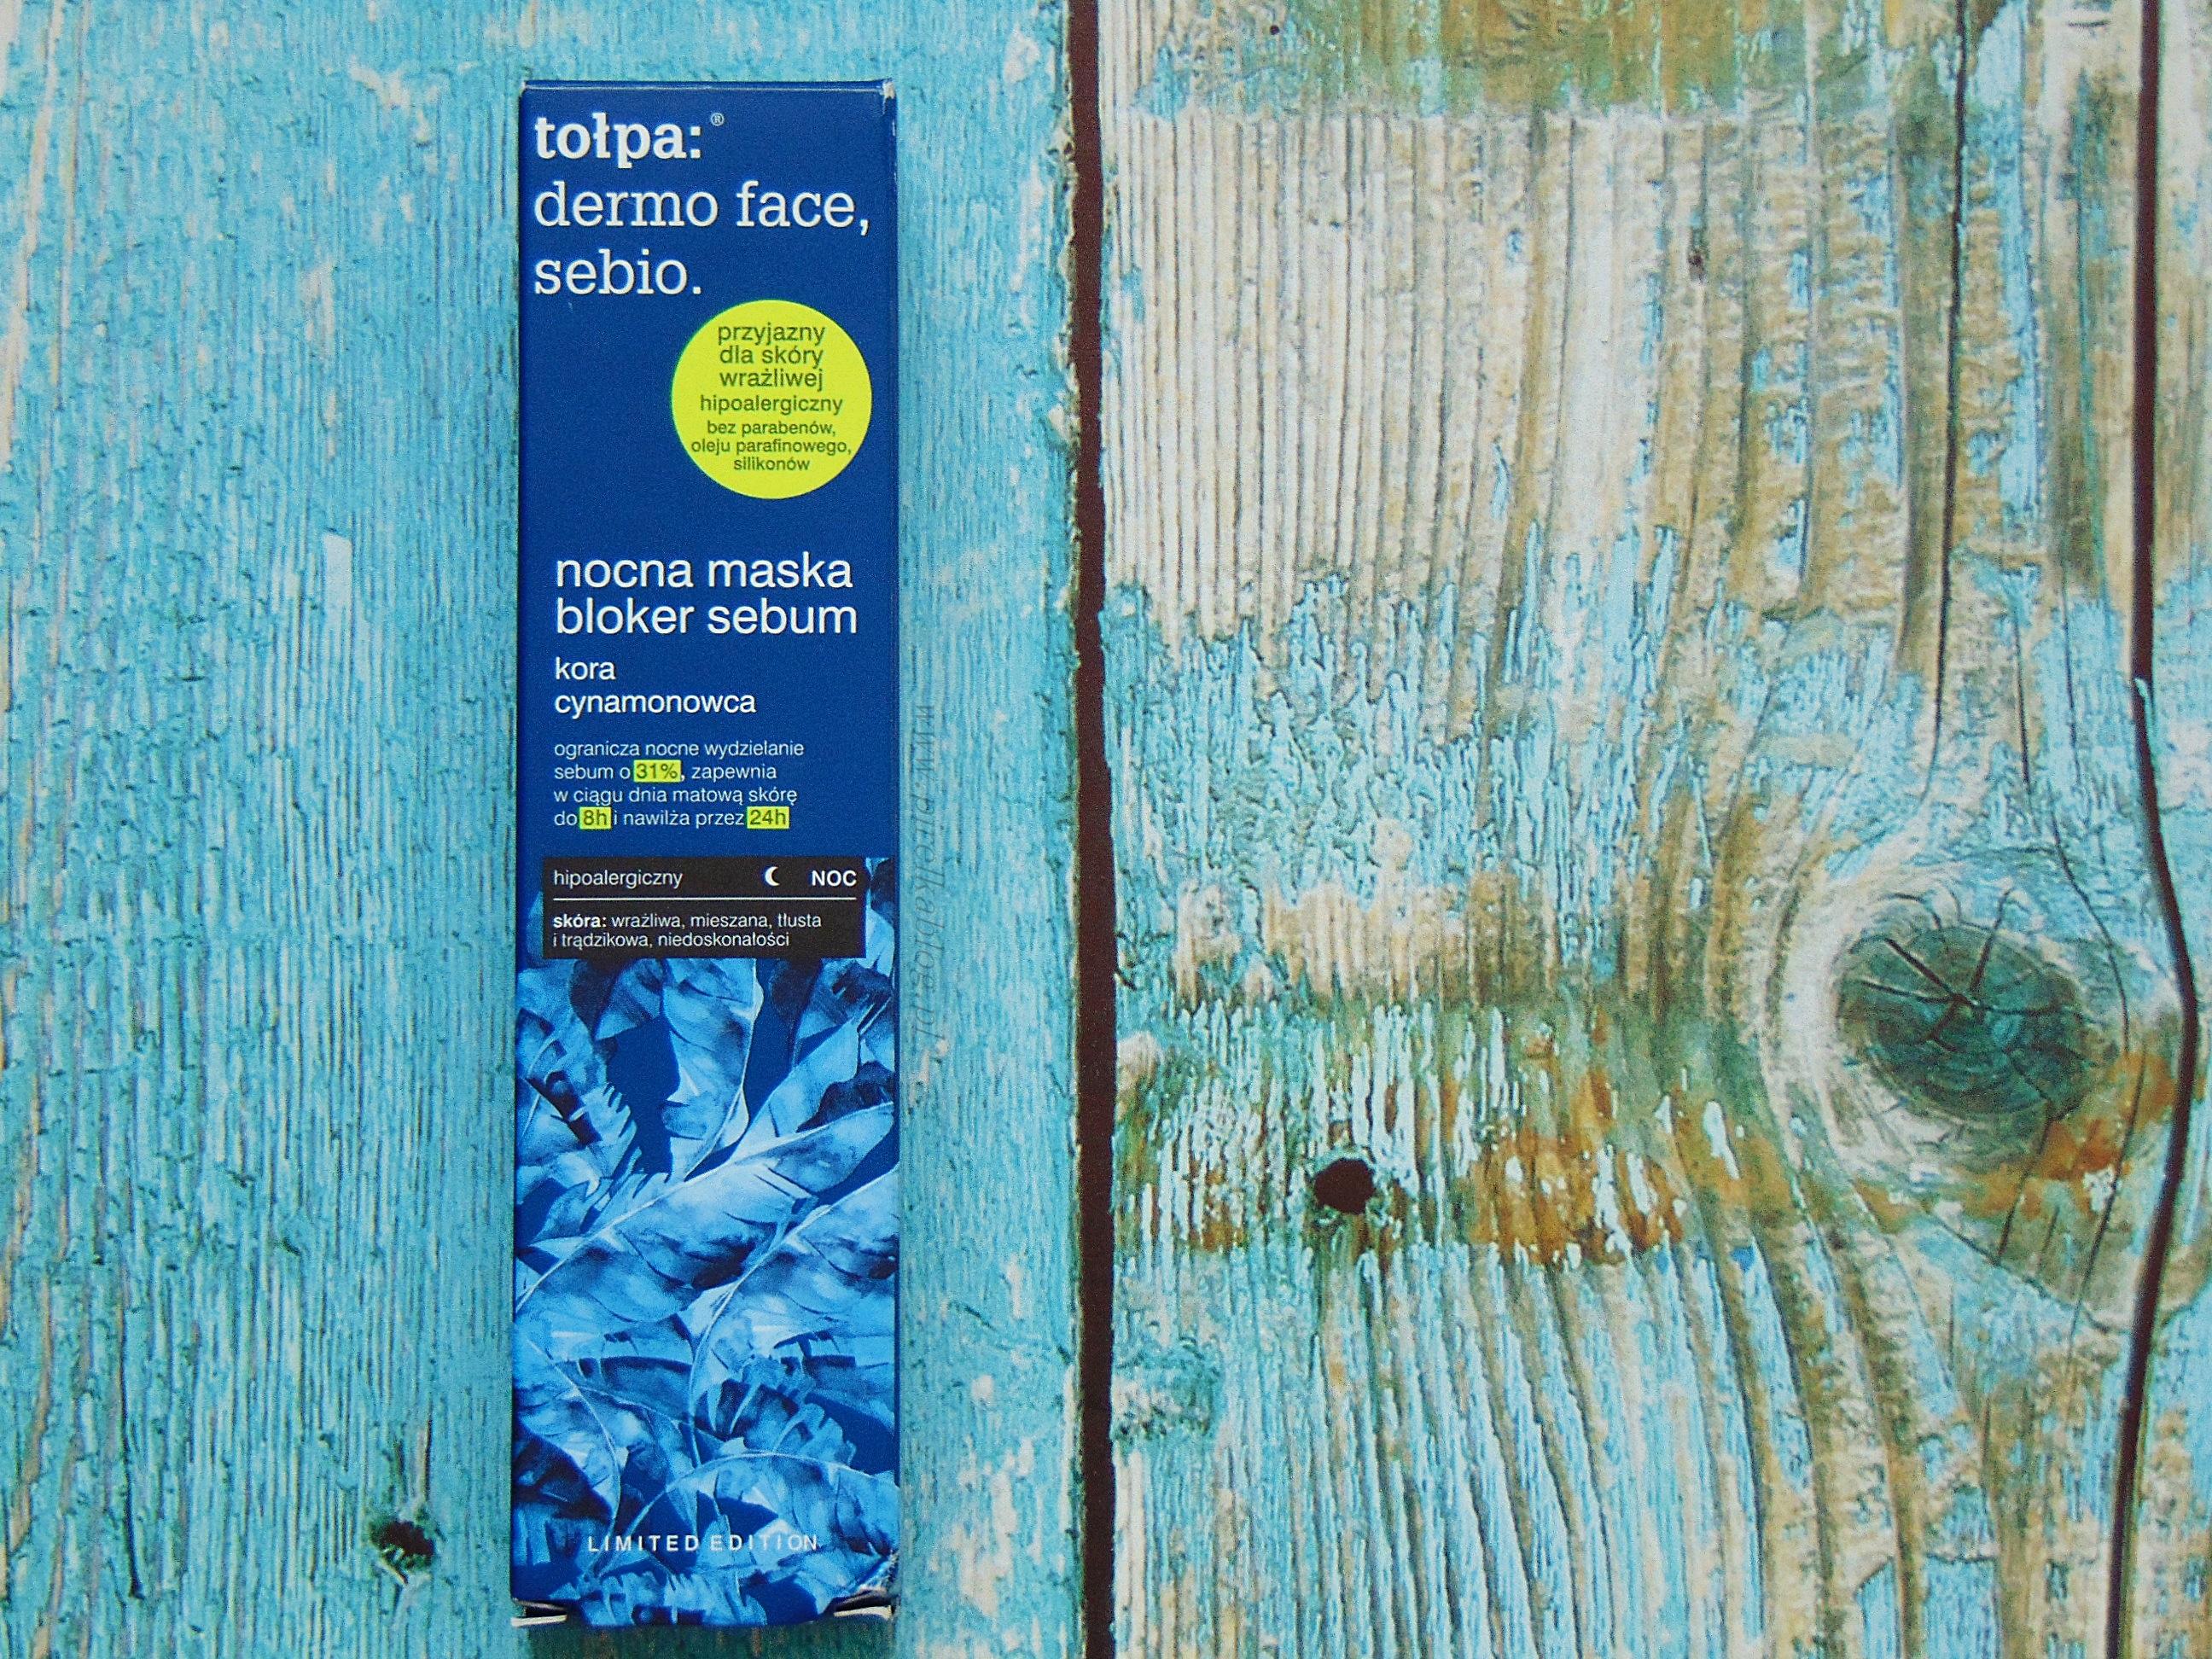 Tołpa sebio - Nocna maska-bloker sebum